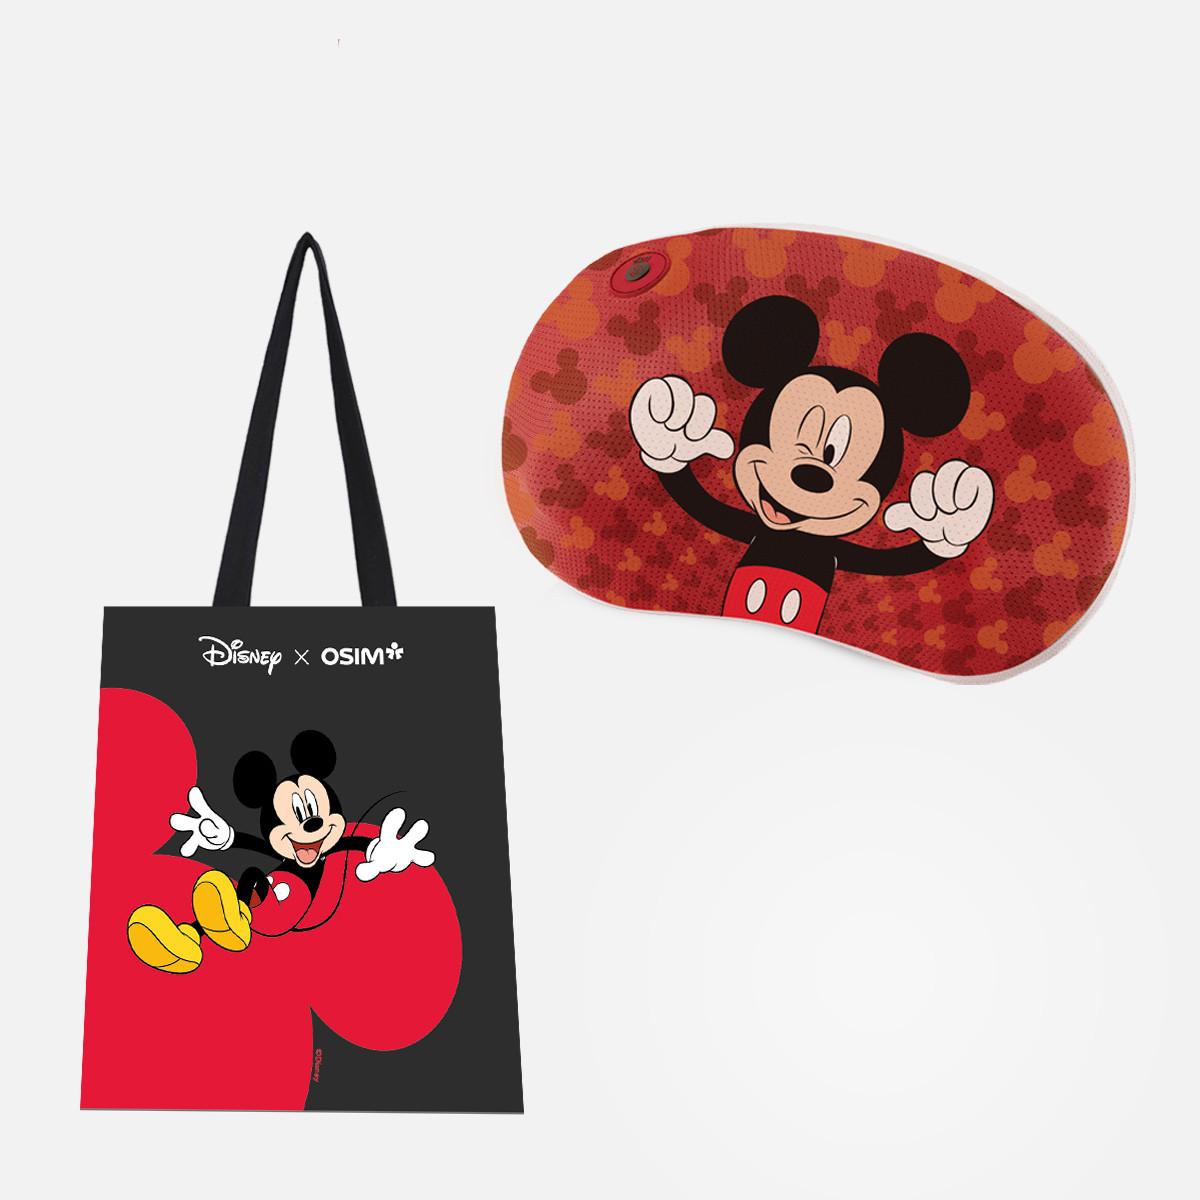 uCozy X Disney + FREE Tote Bag